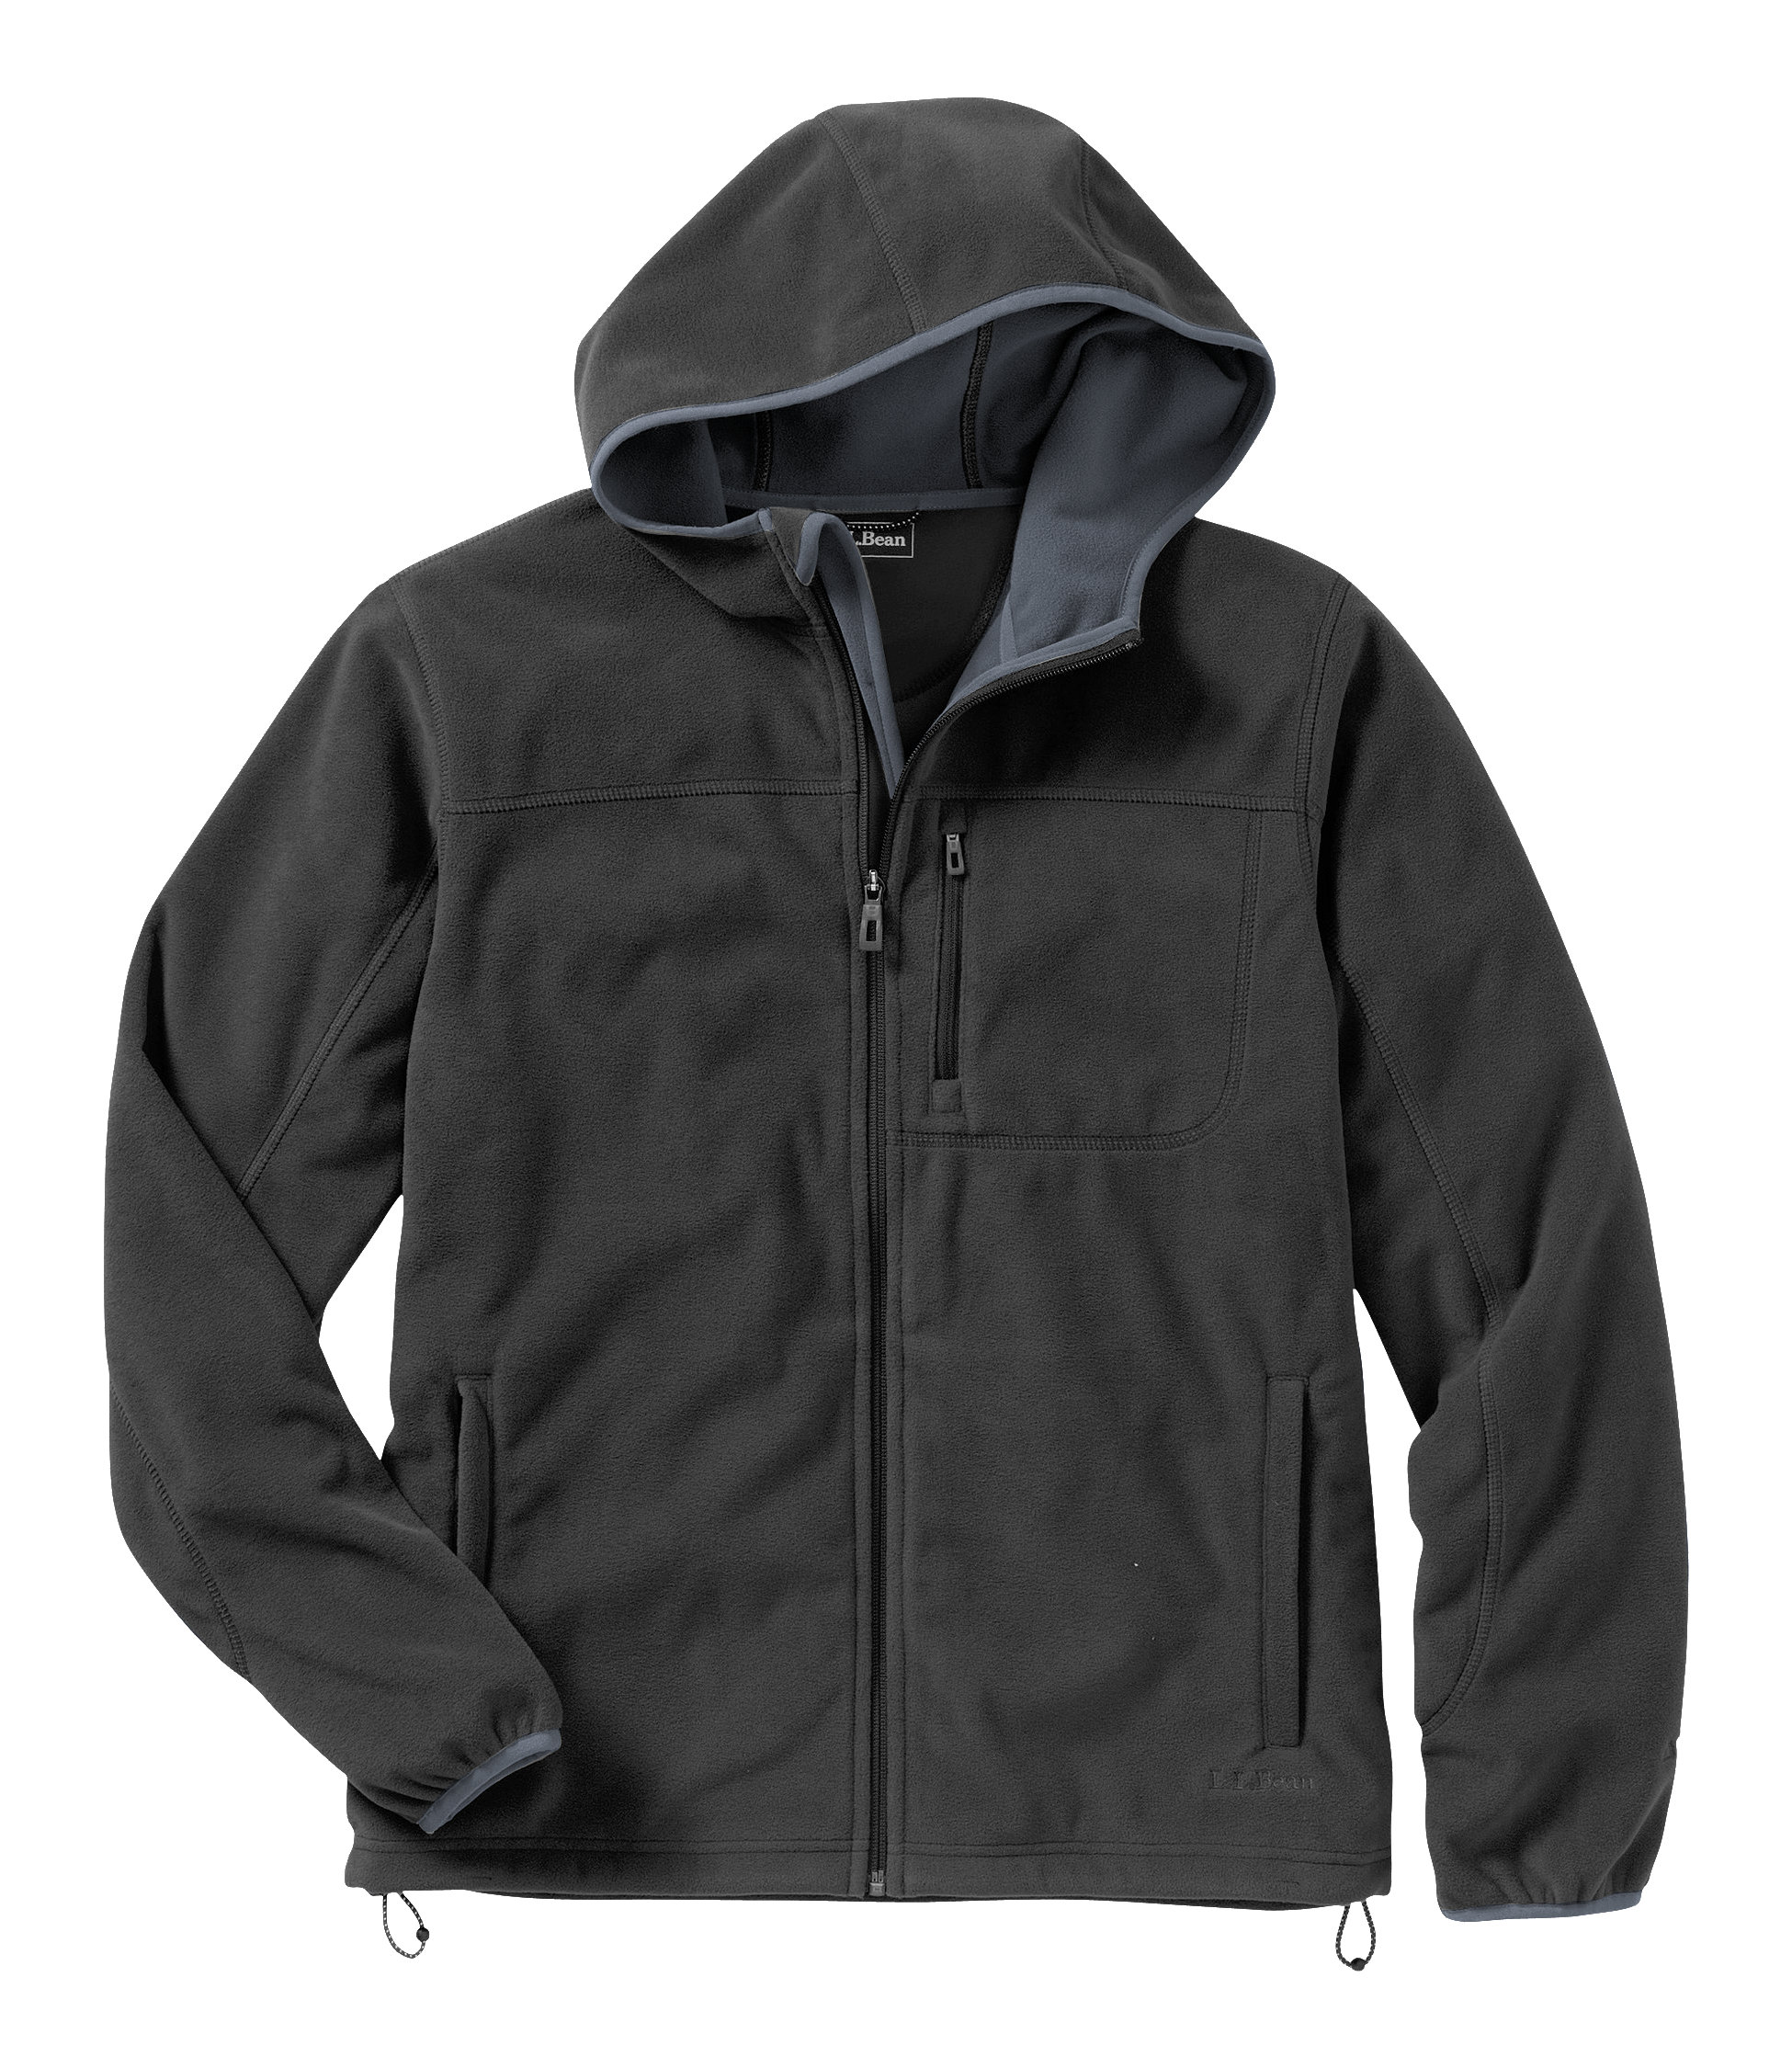 L.L.Bean Wind Challenger Fleece, Hooded Jacket